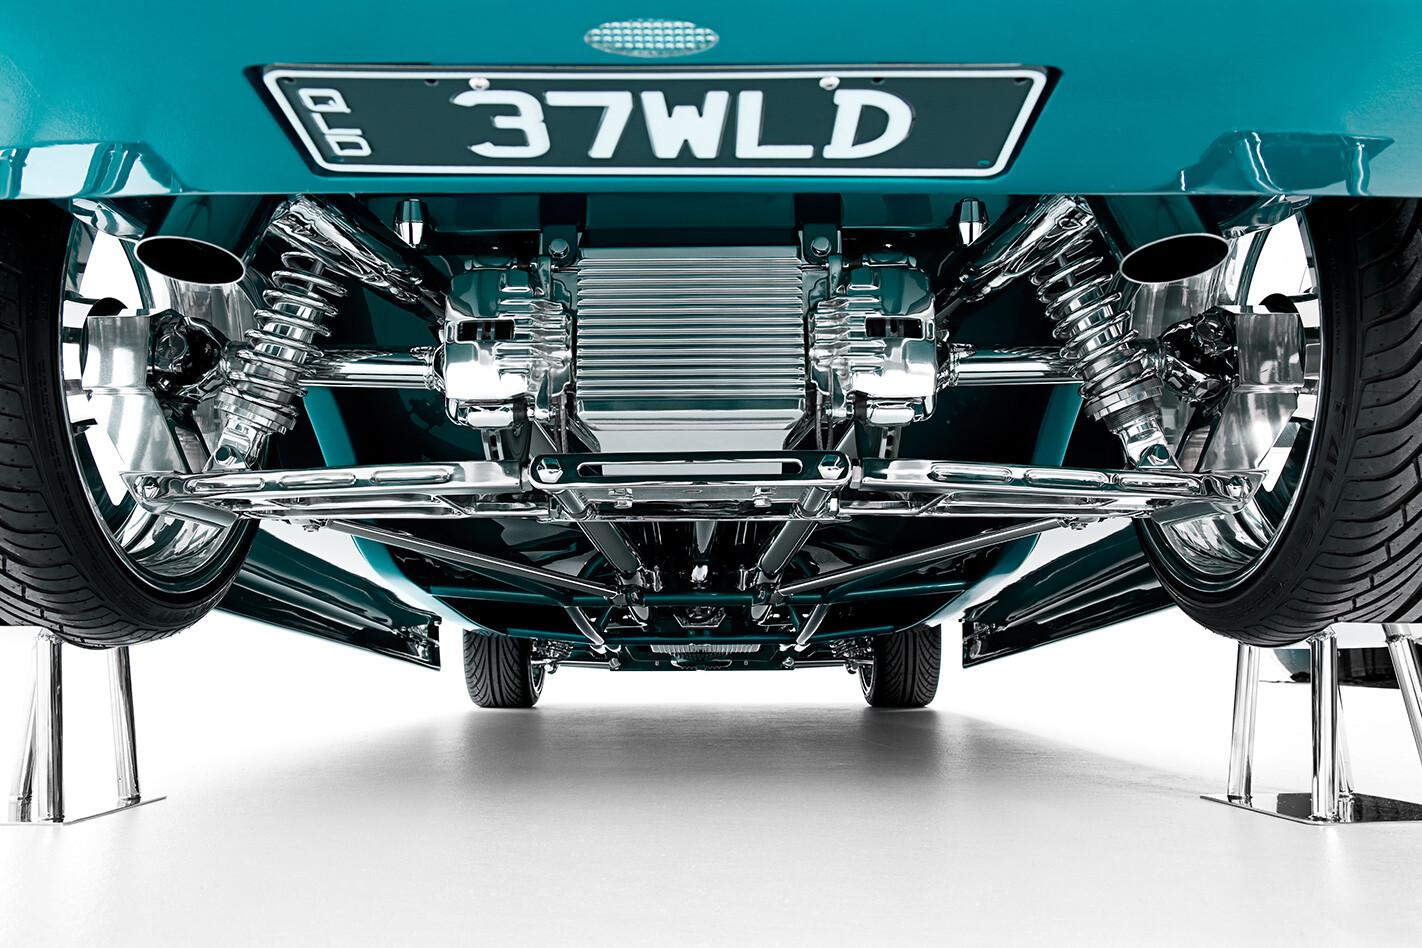 Ford Roadster under